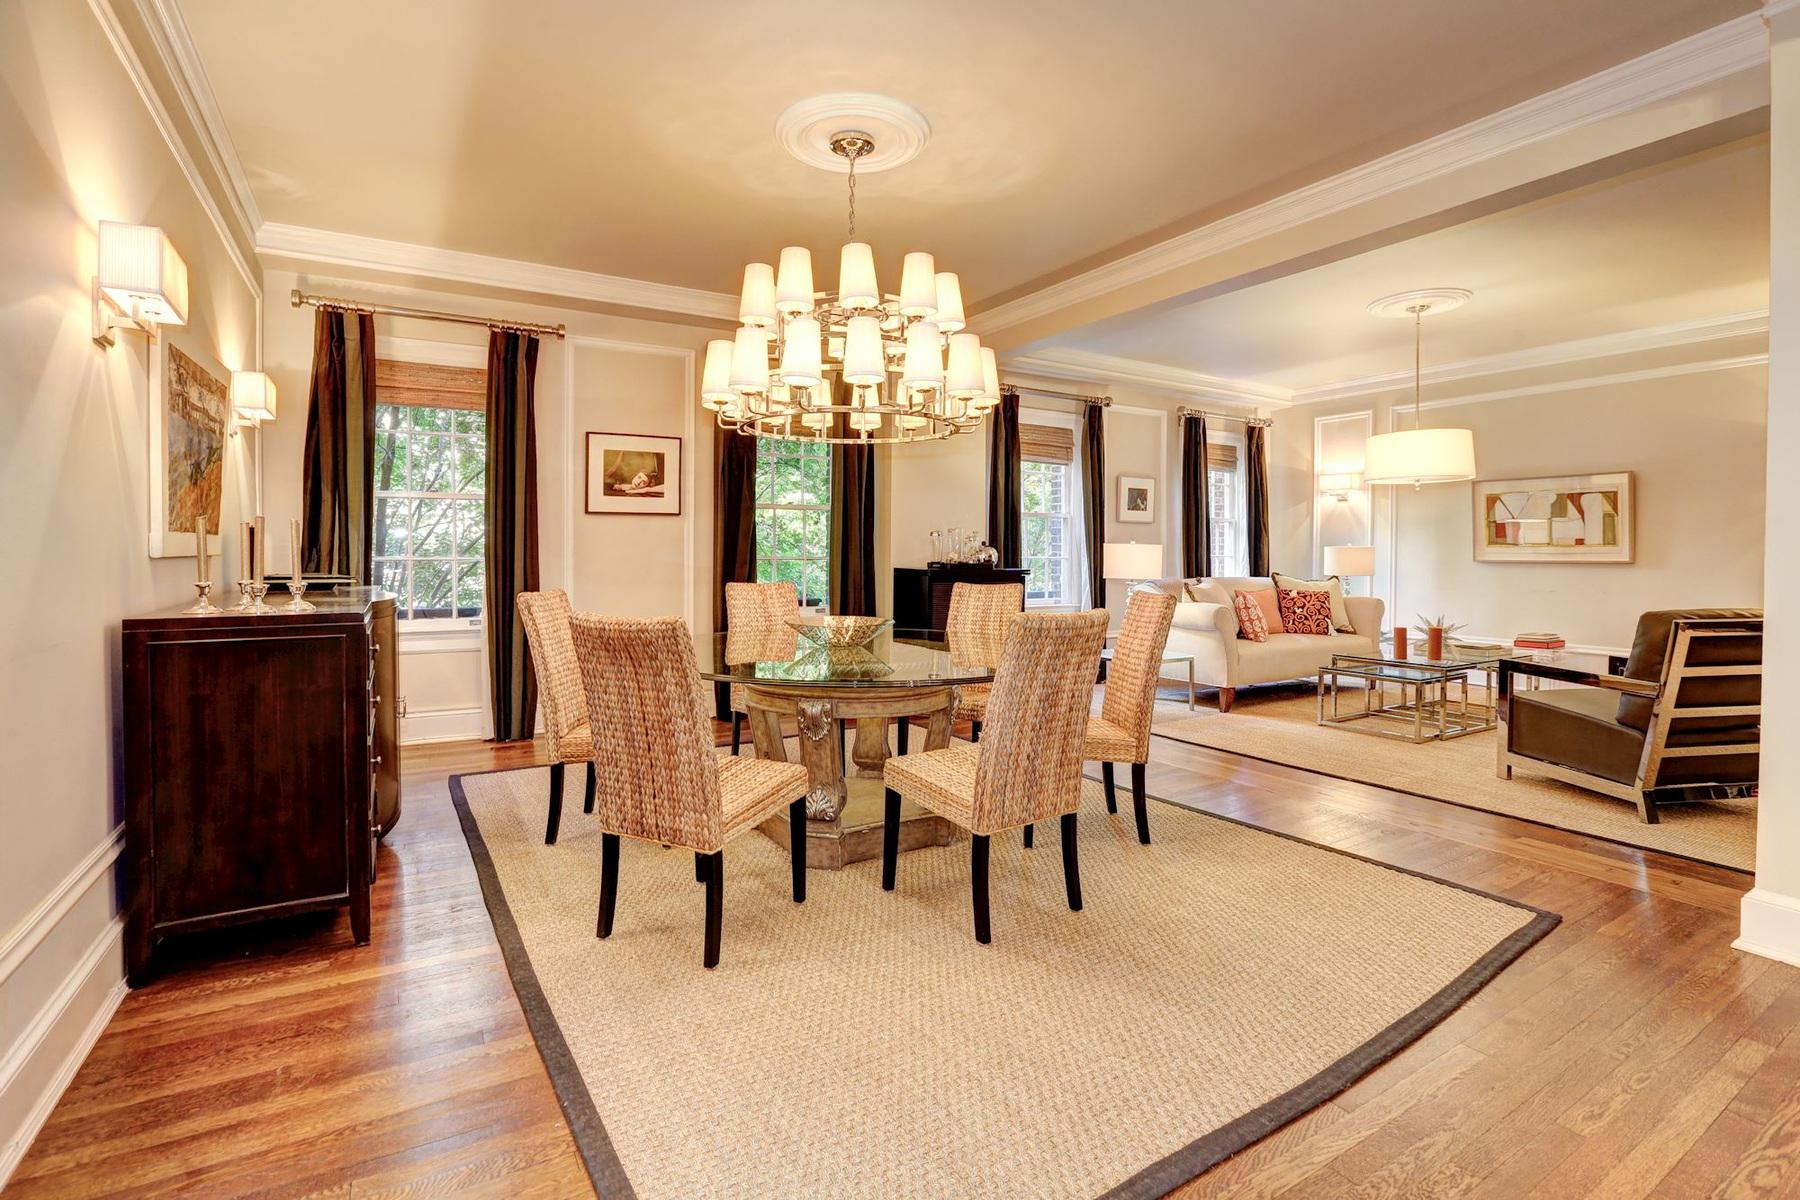 Additional photo for property listing at 1661 Crescent Place Nw 210, Washington  Washington, 哥倫比亞特區 20009 美國